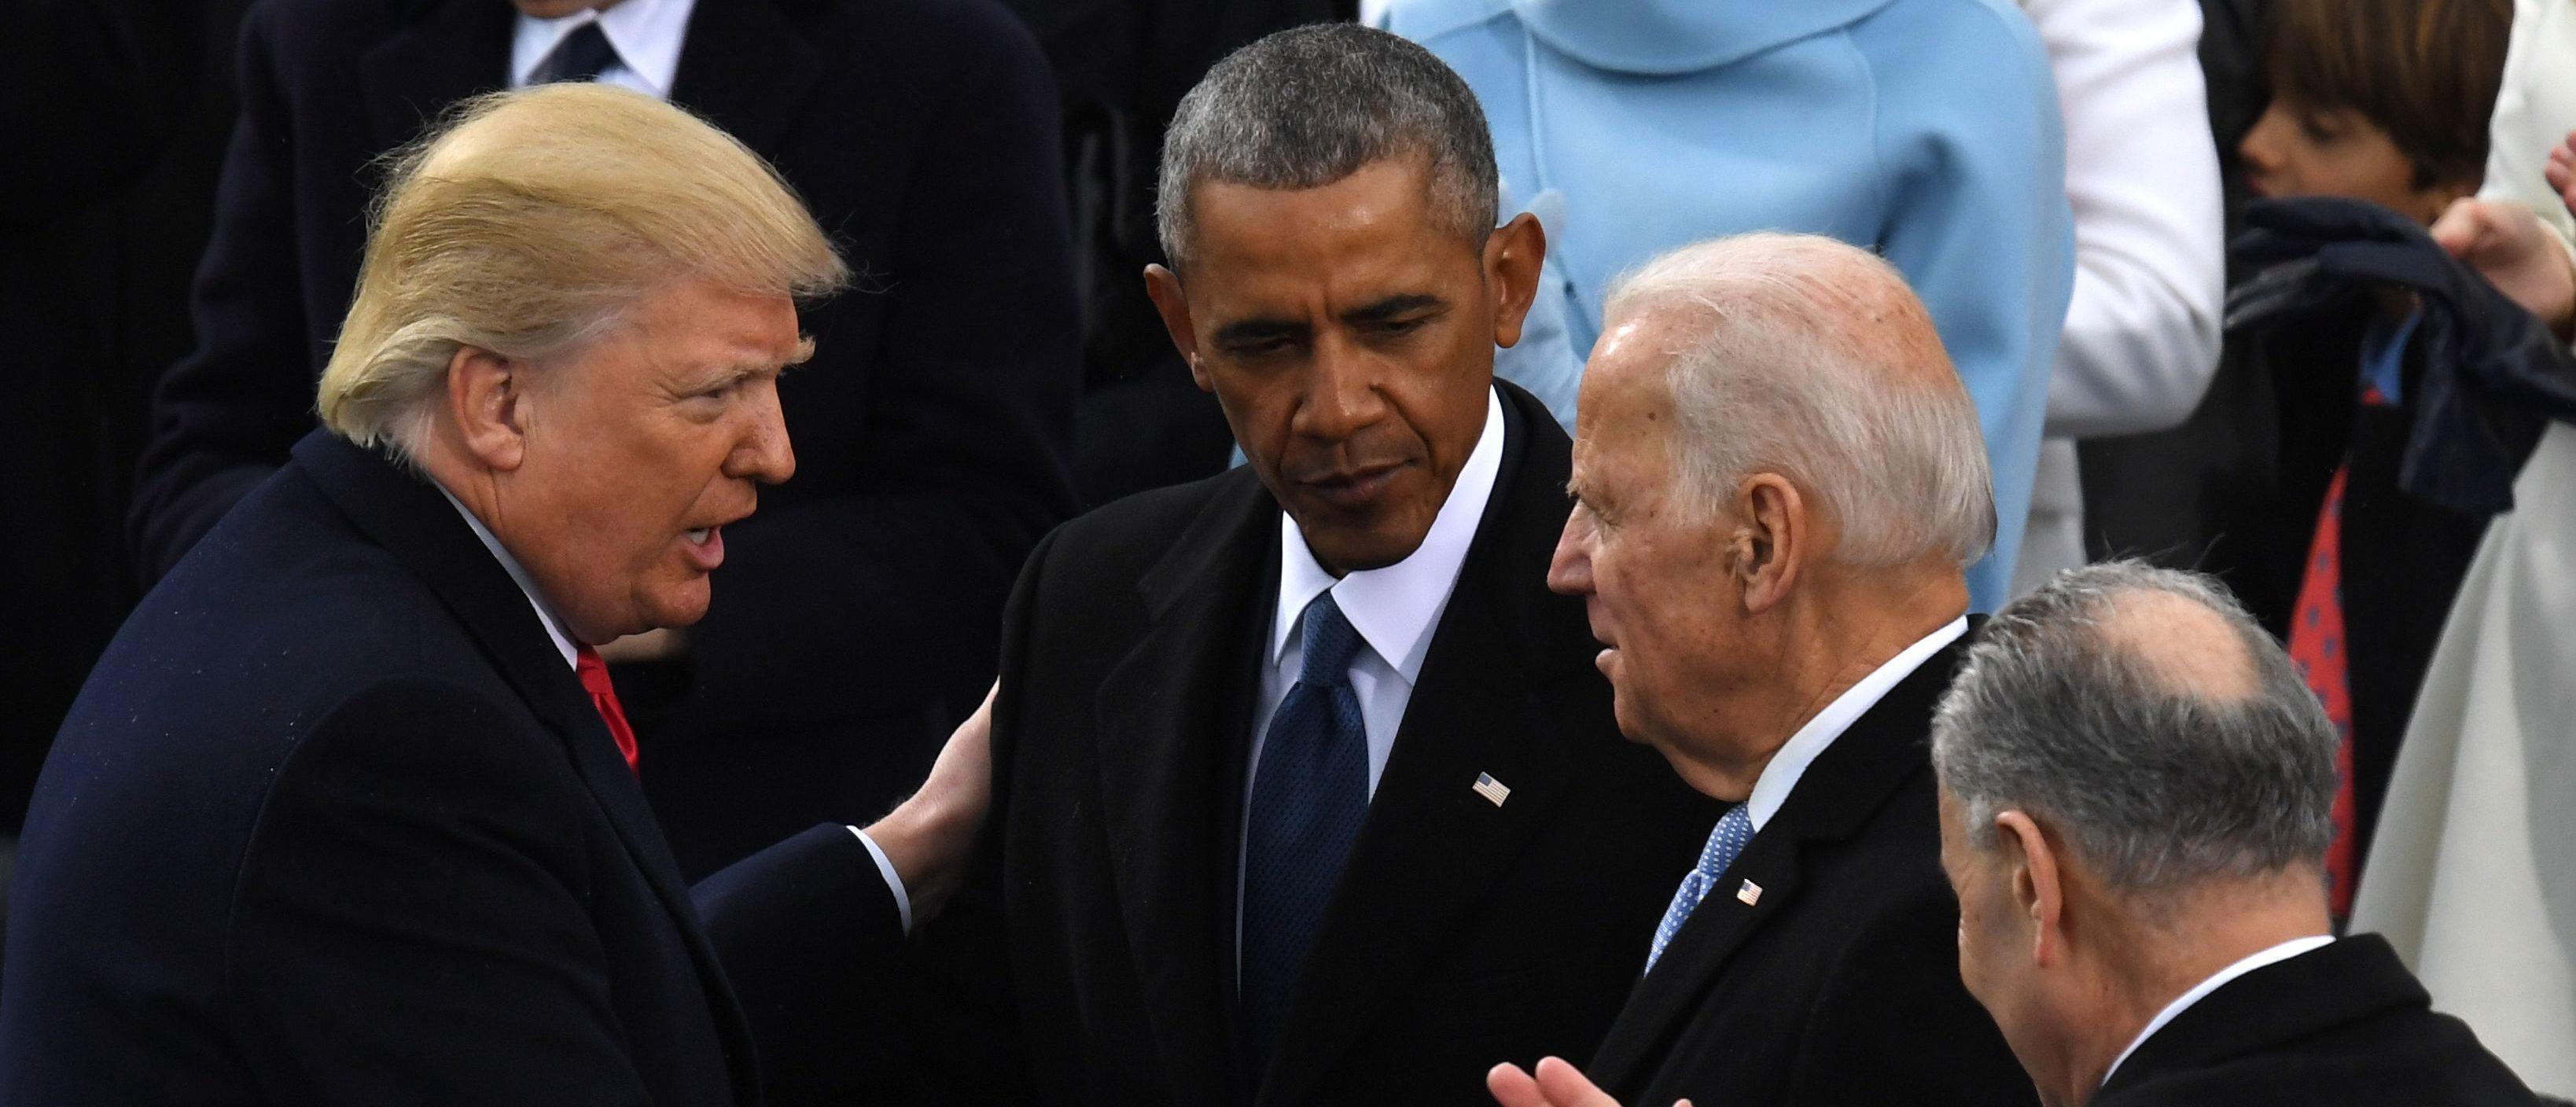 Race Relations Plummeted While Joe Biden Was Vice President Under Barack Obama